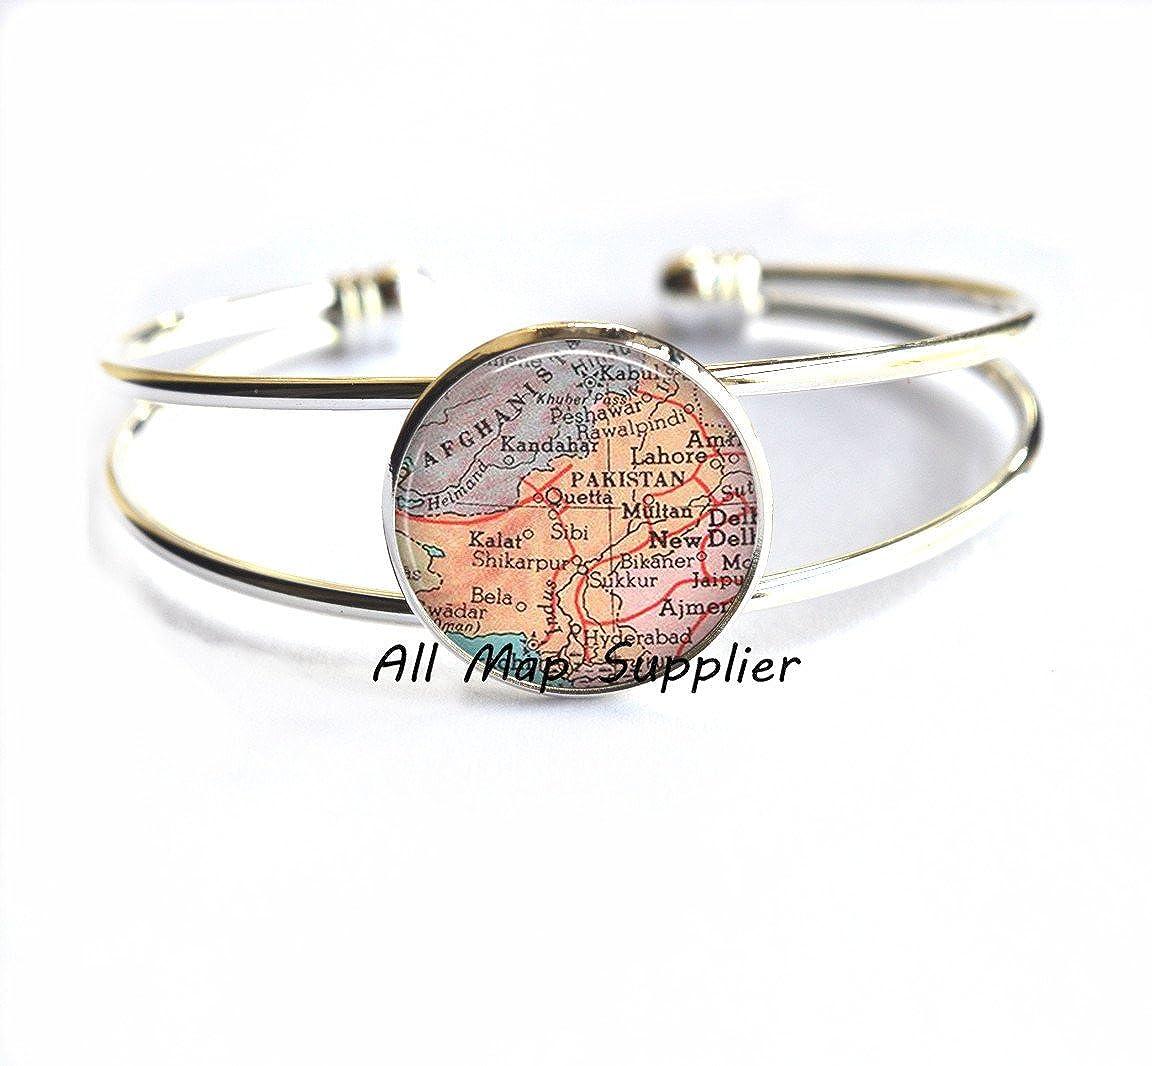 AllMapsupplier Charming Bracelet,Pakistan map Bracelets Pakistan Bracelet map jewelry Pakistan map Bracelet,A0113/ Pakistan Bracelets